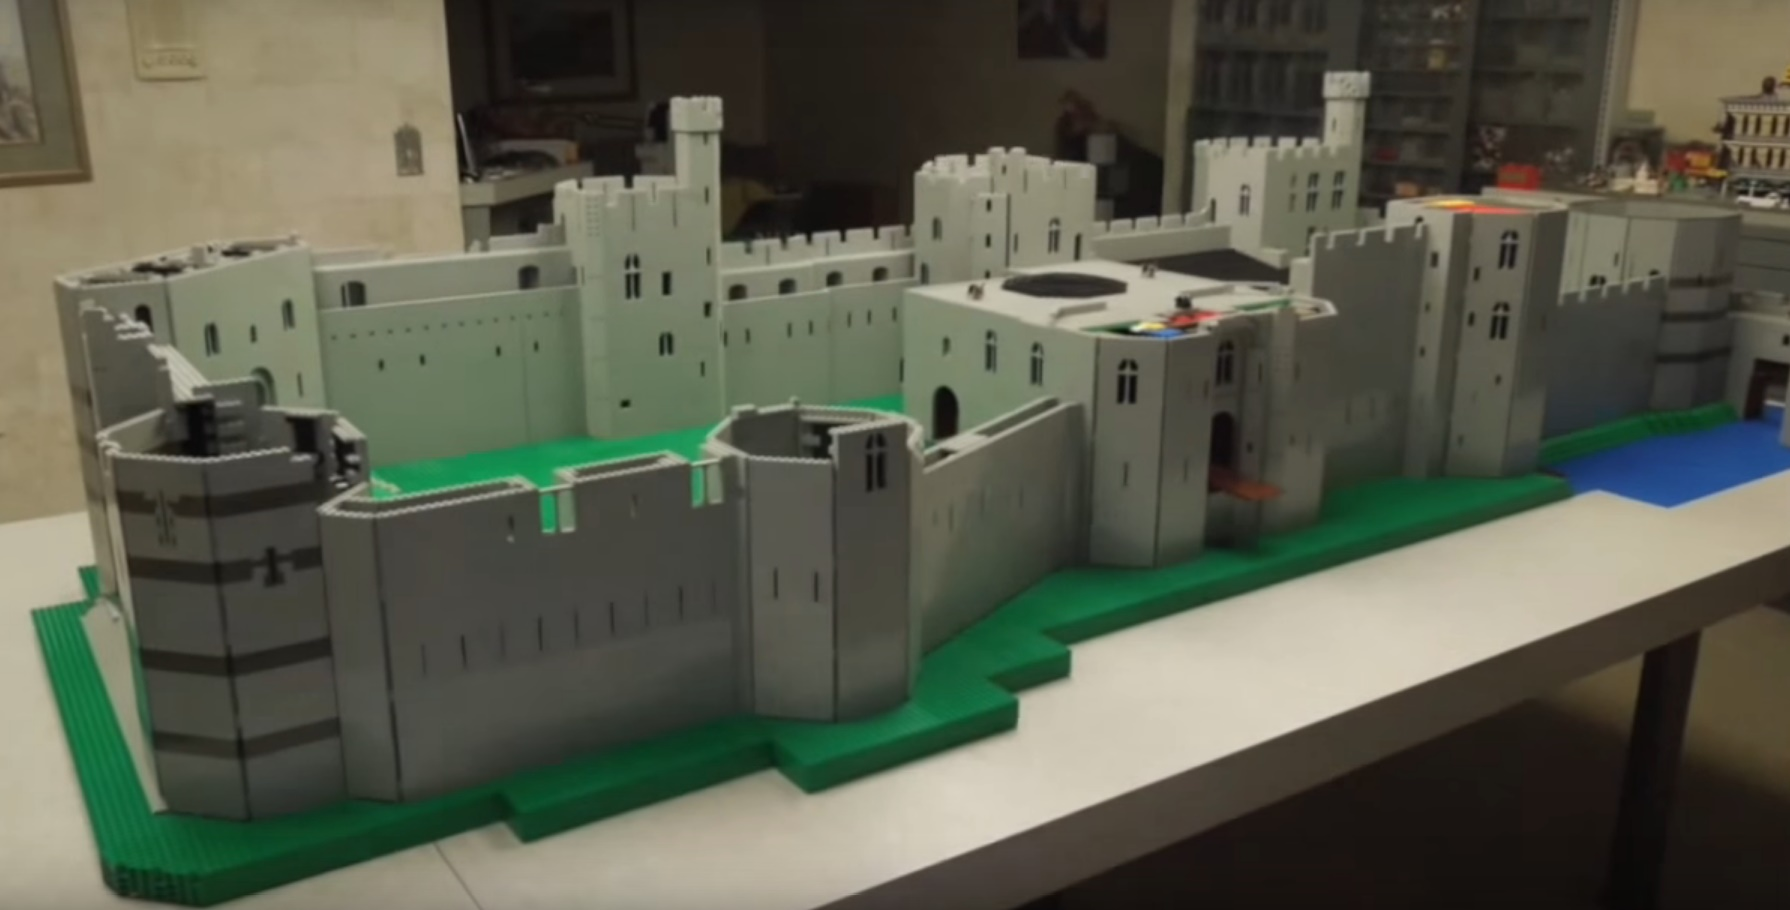 Caernarfon Castle Built out of Lego by American Hobbyist